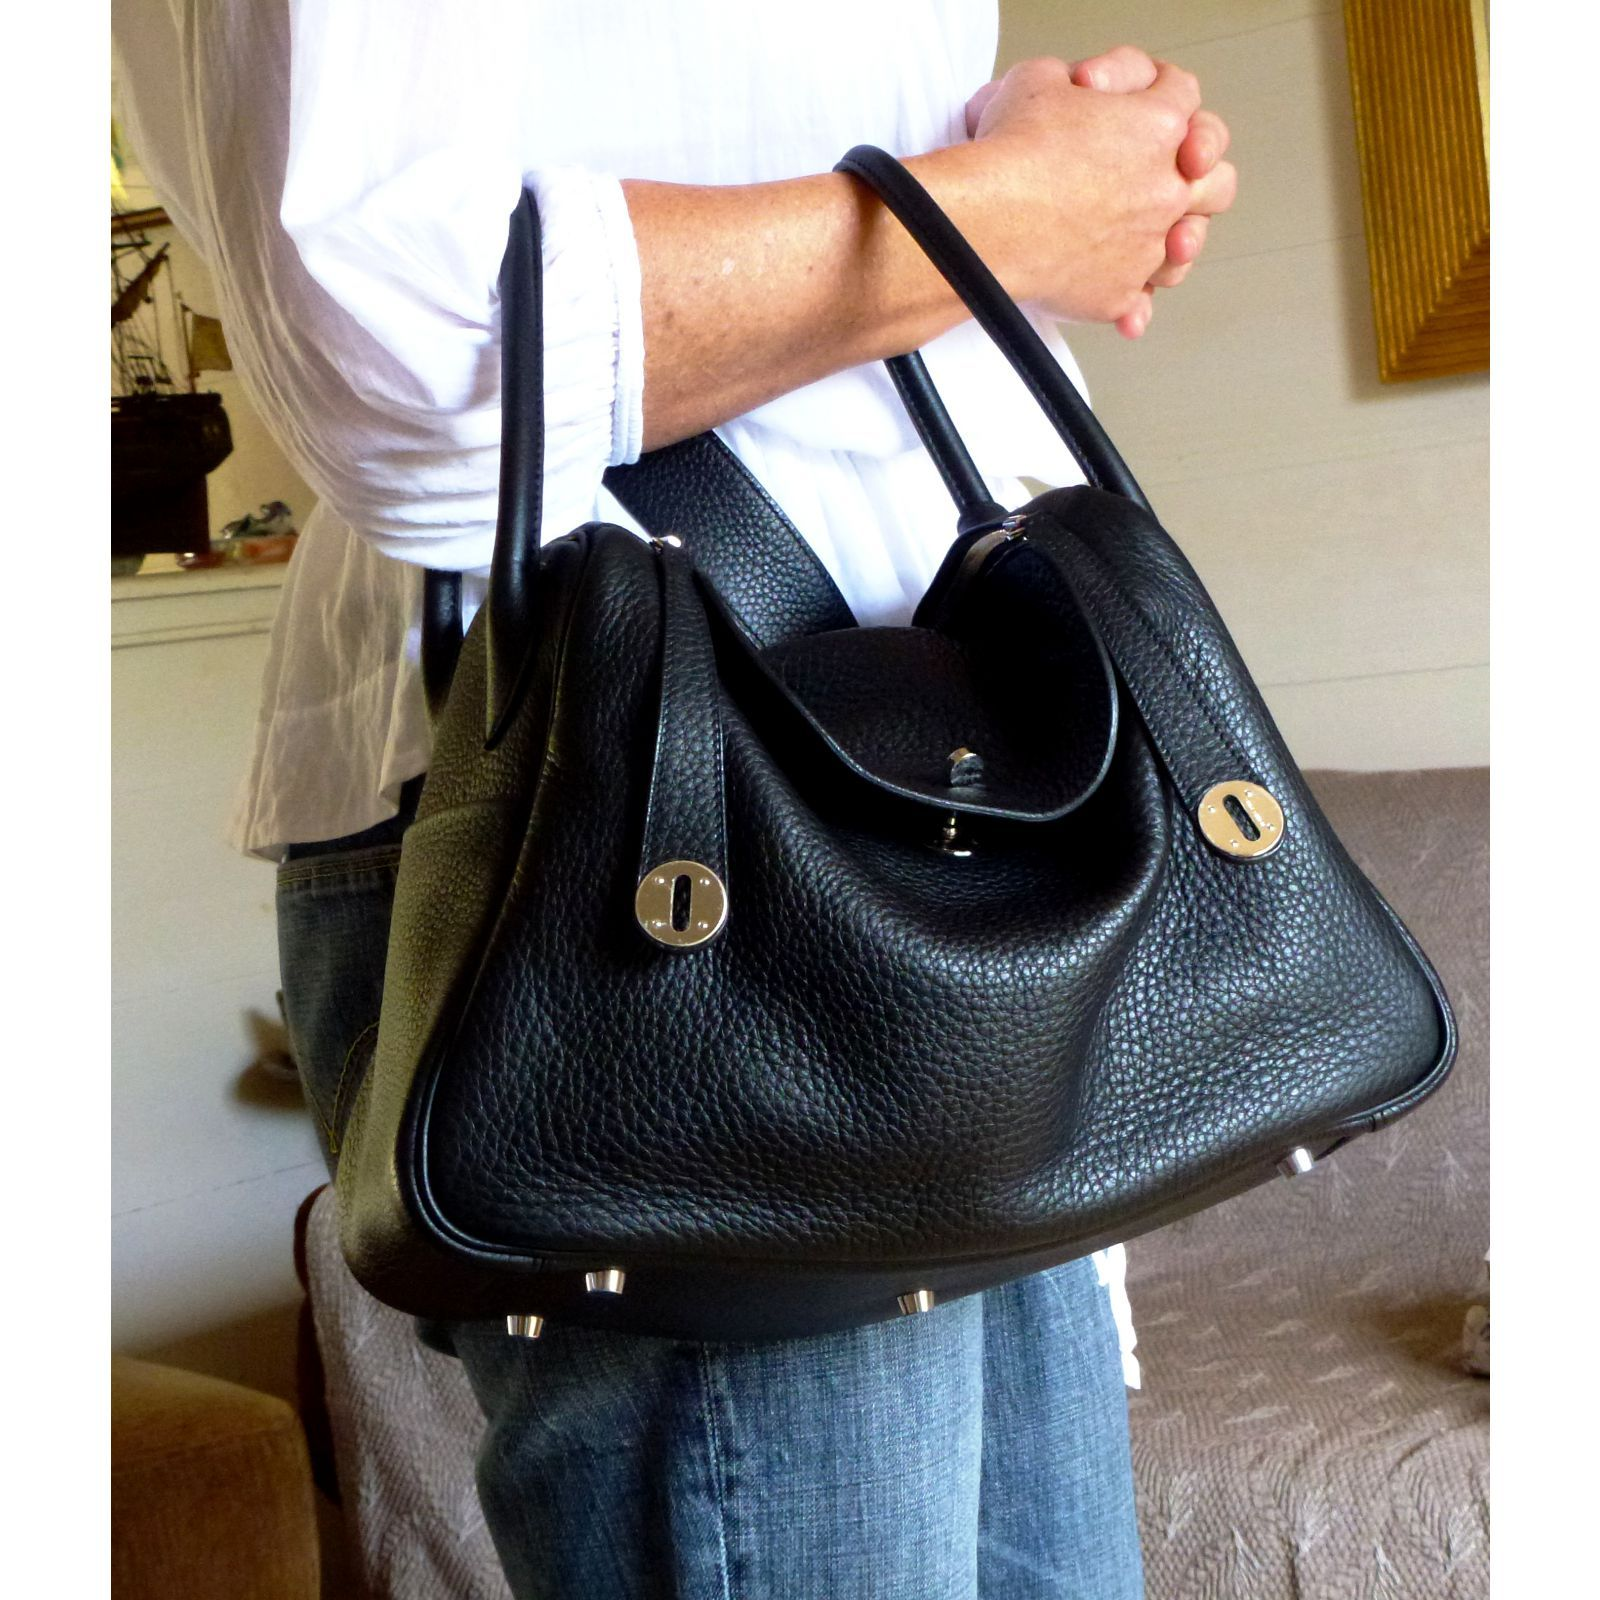 hermes LINDY handbag (With images) | Hermes lindy bag, Hermes lindy, Hermes handbags